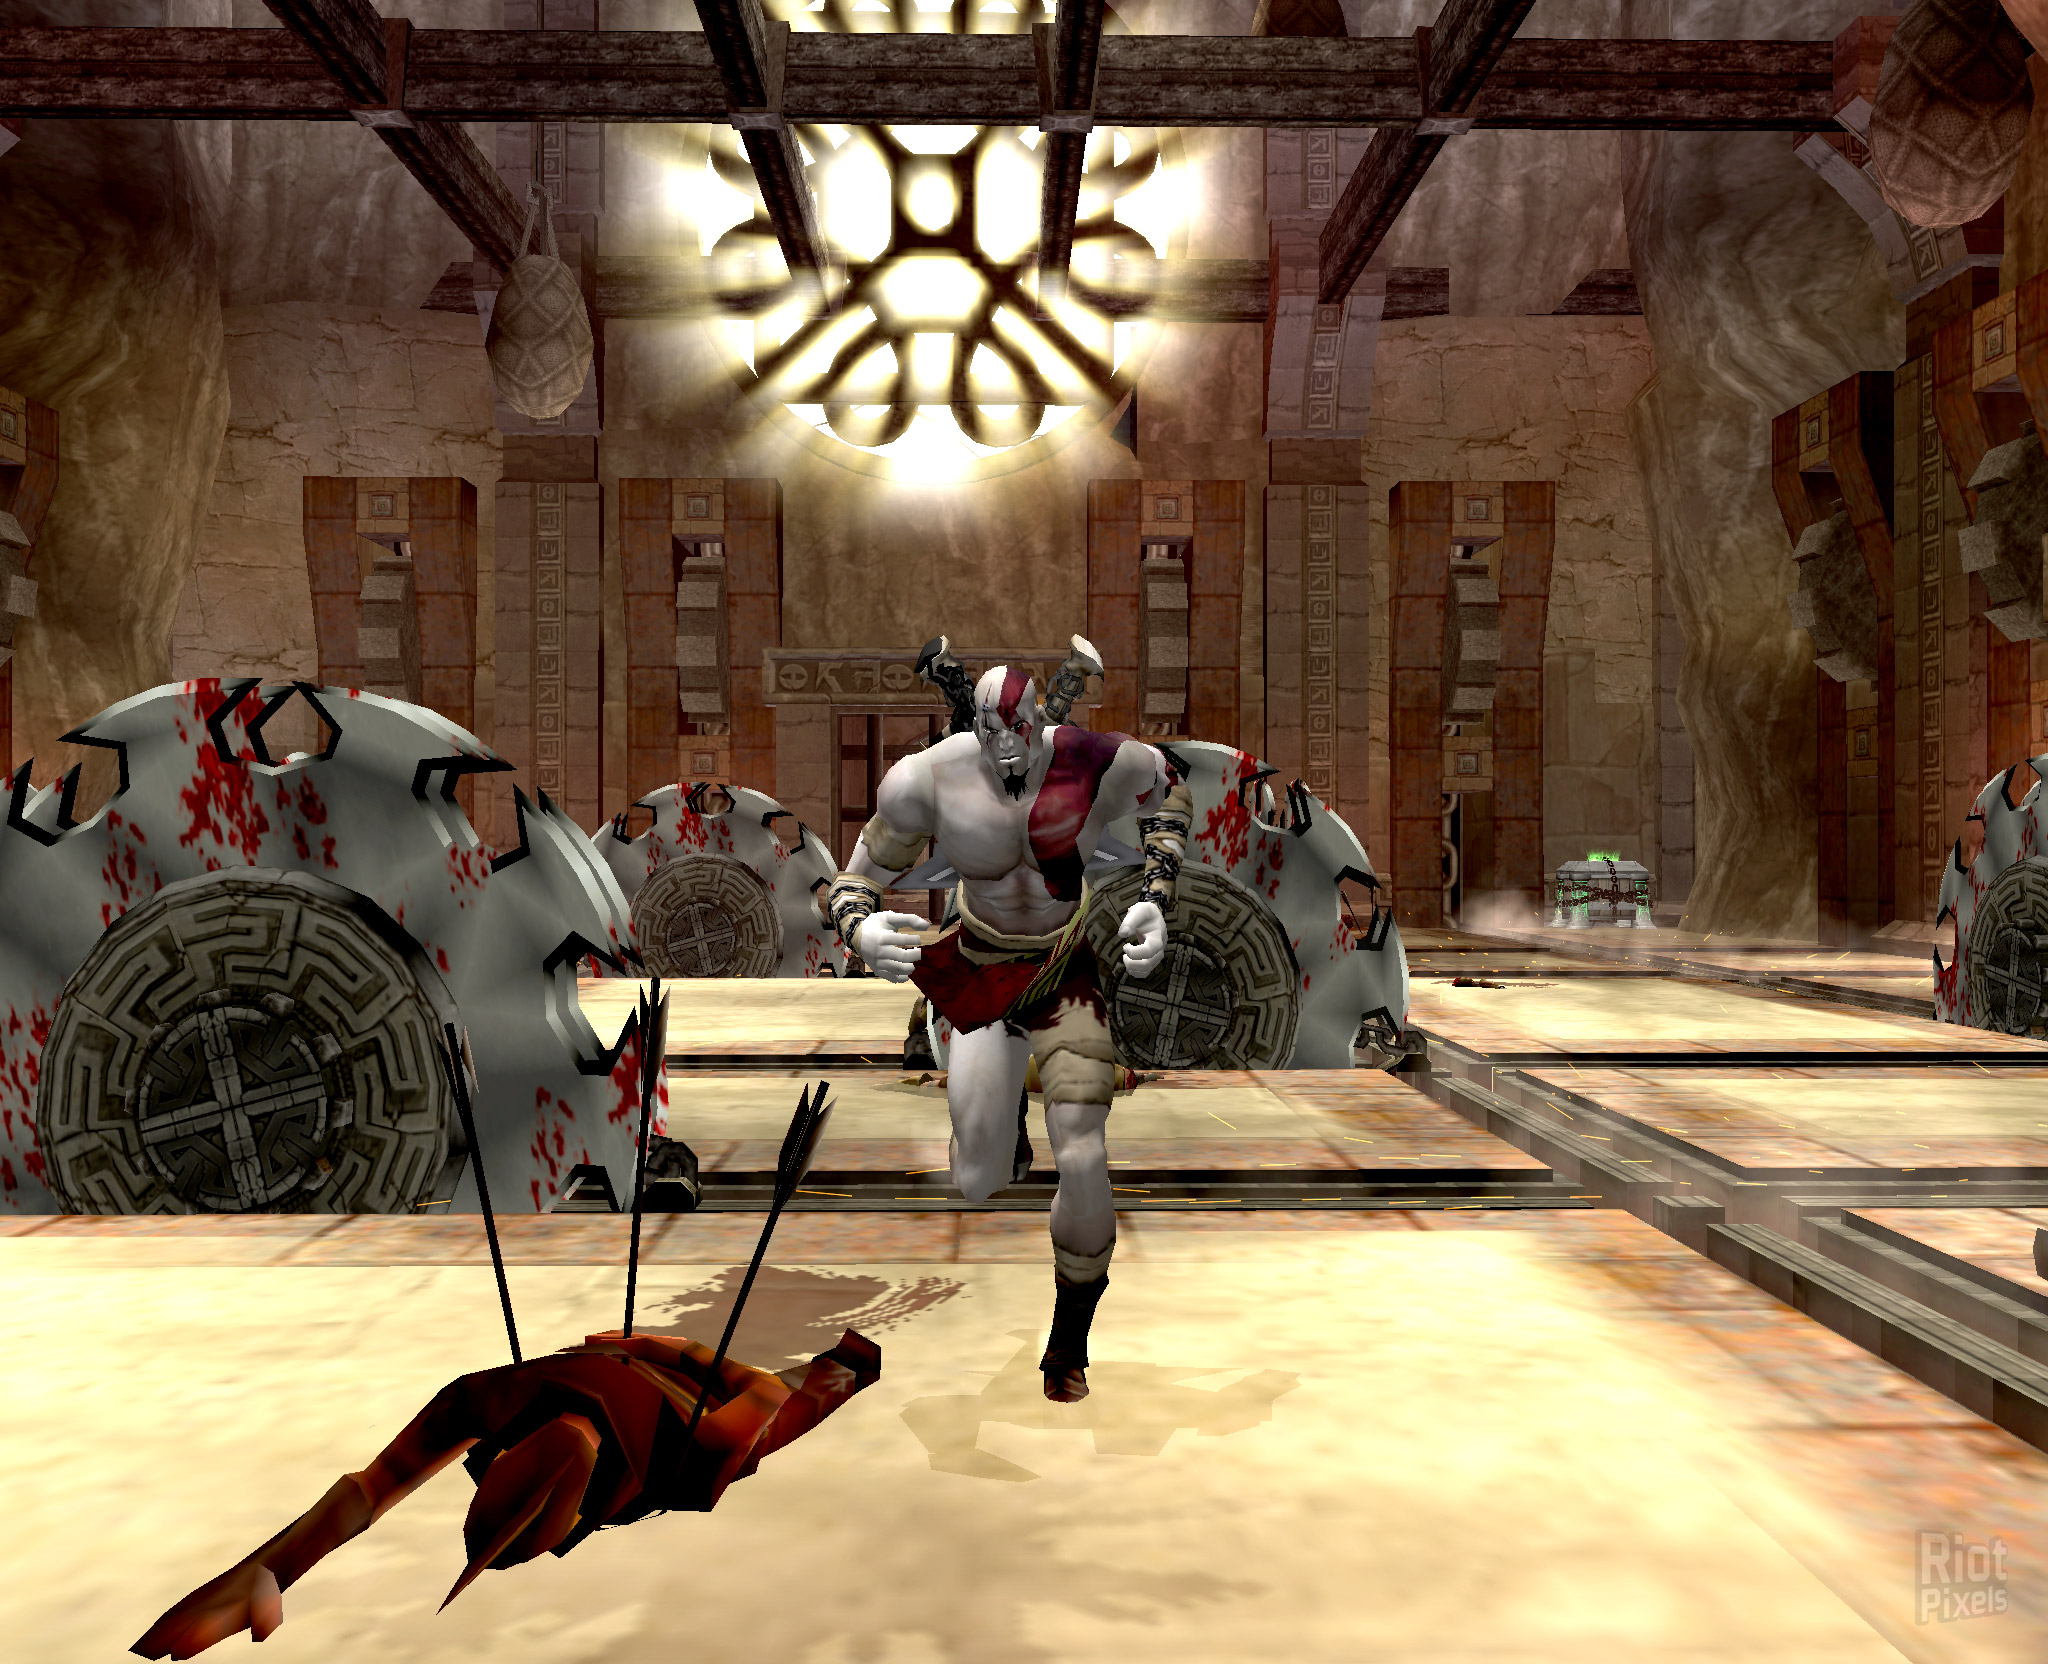 God Of War 1 PC Game Free Download Full Version